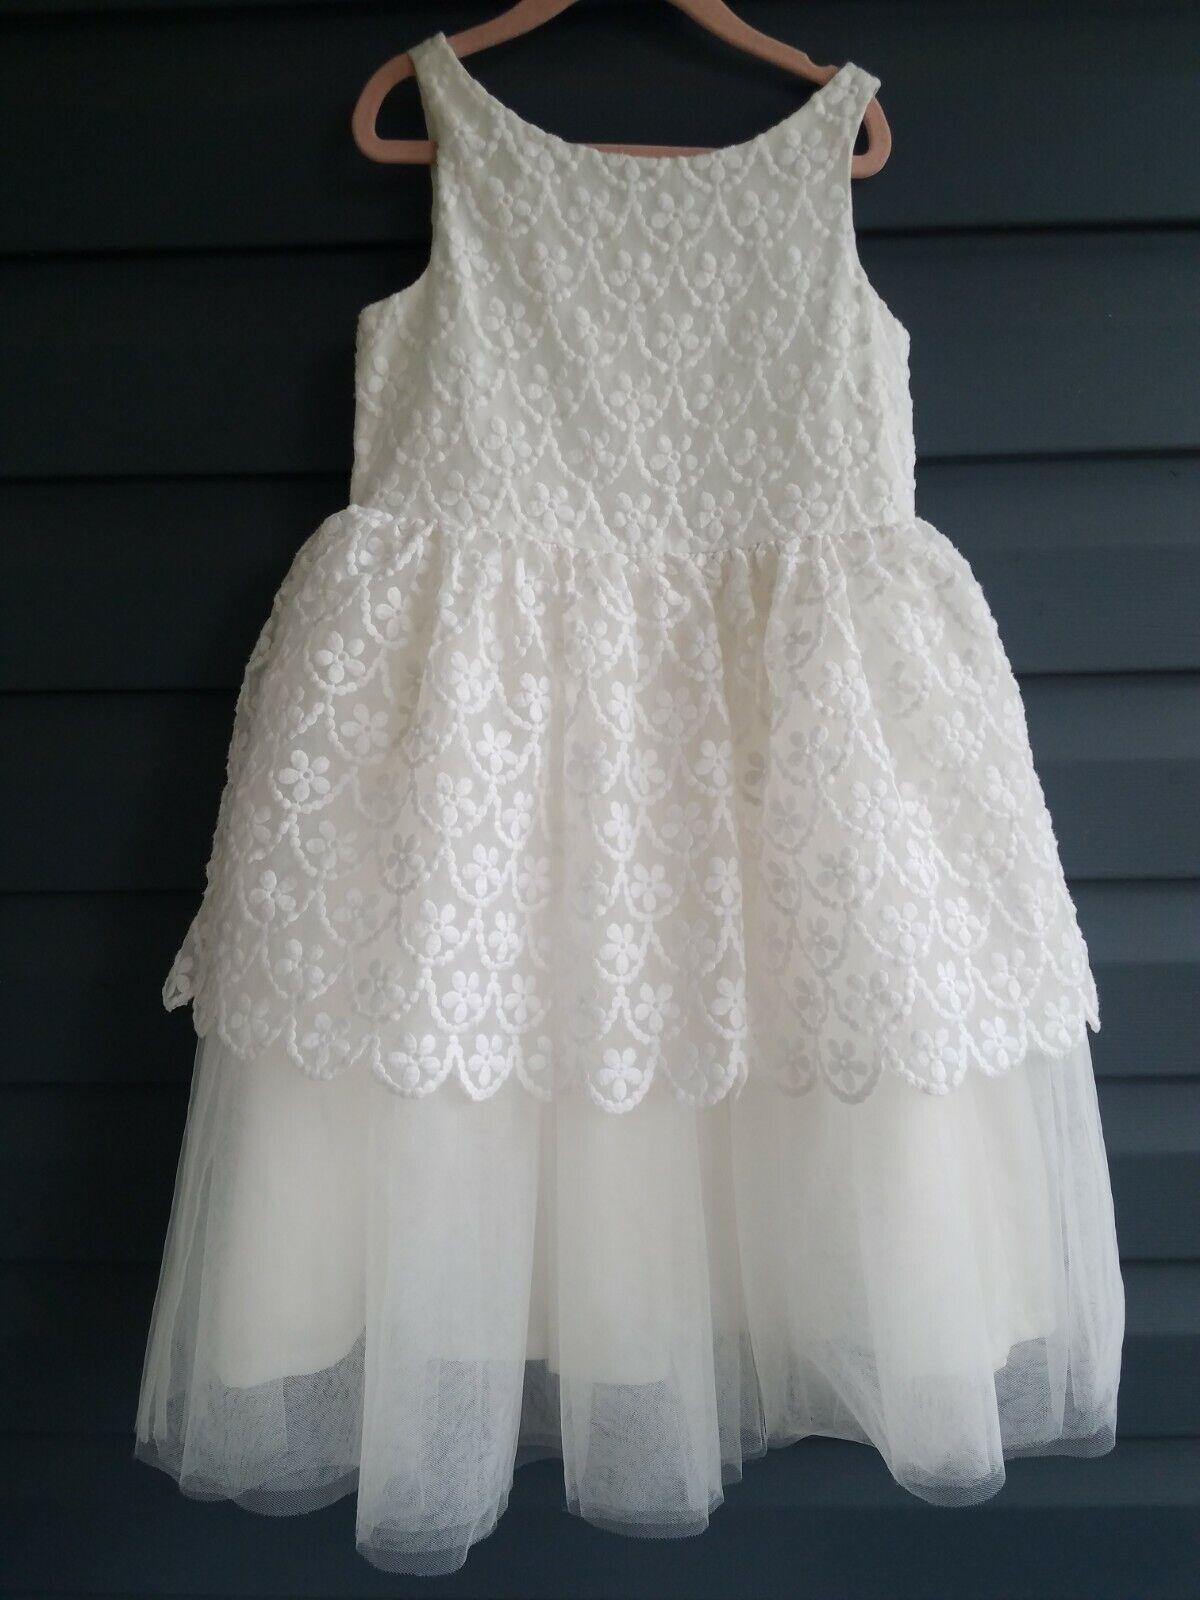 6 7 Janie Jack Special Occasion White Girls Dress Communion Flower Girl